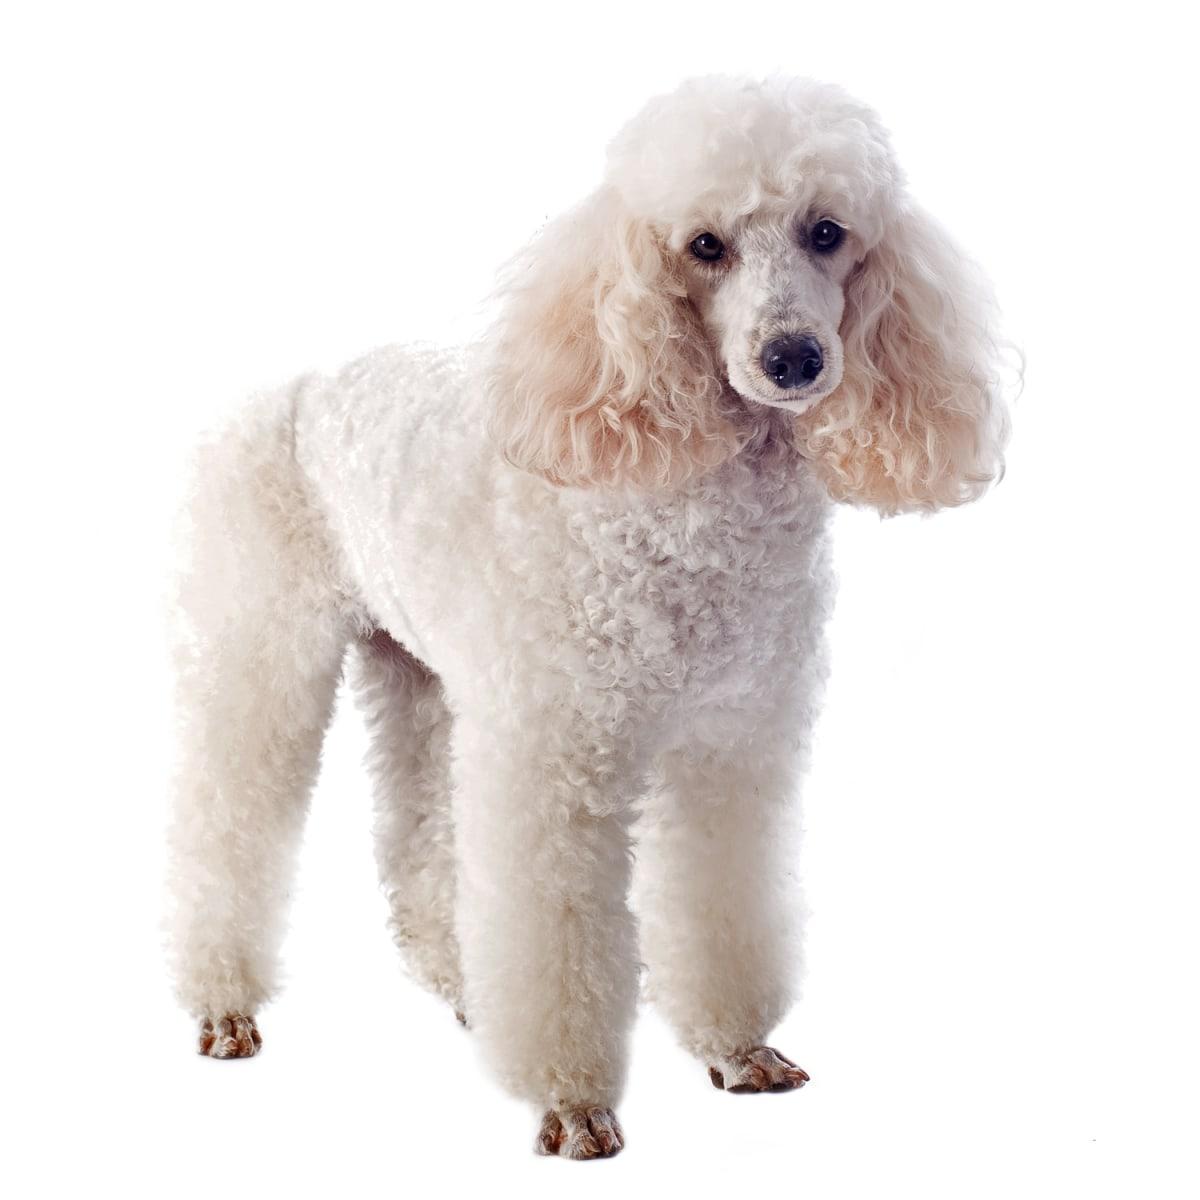 Dogs - Dog Information - Dog Breeds, Pictures]